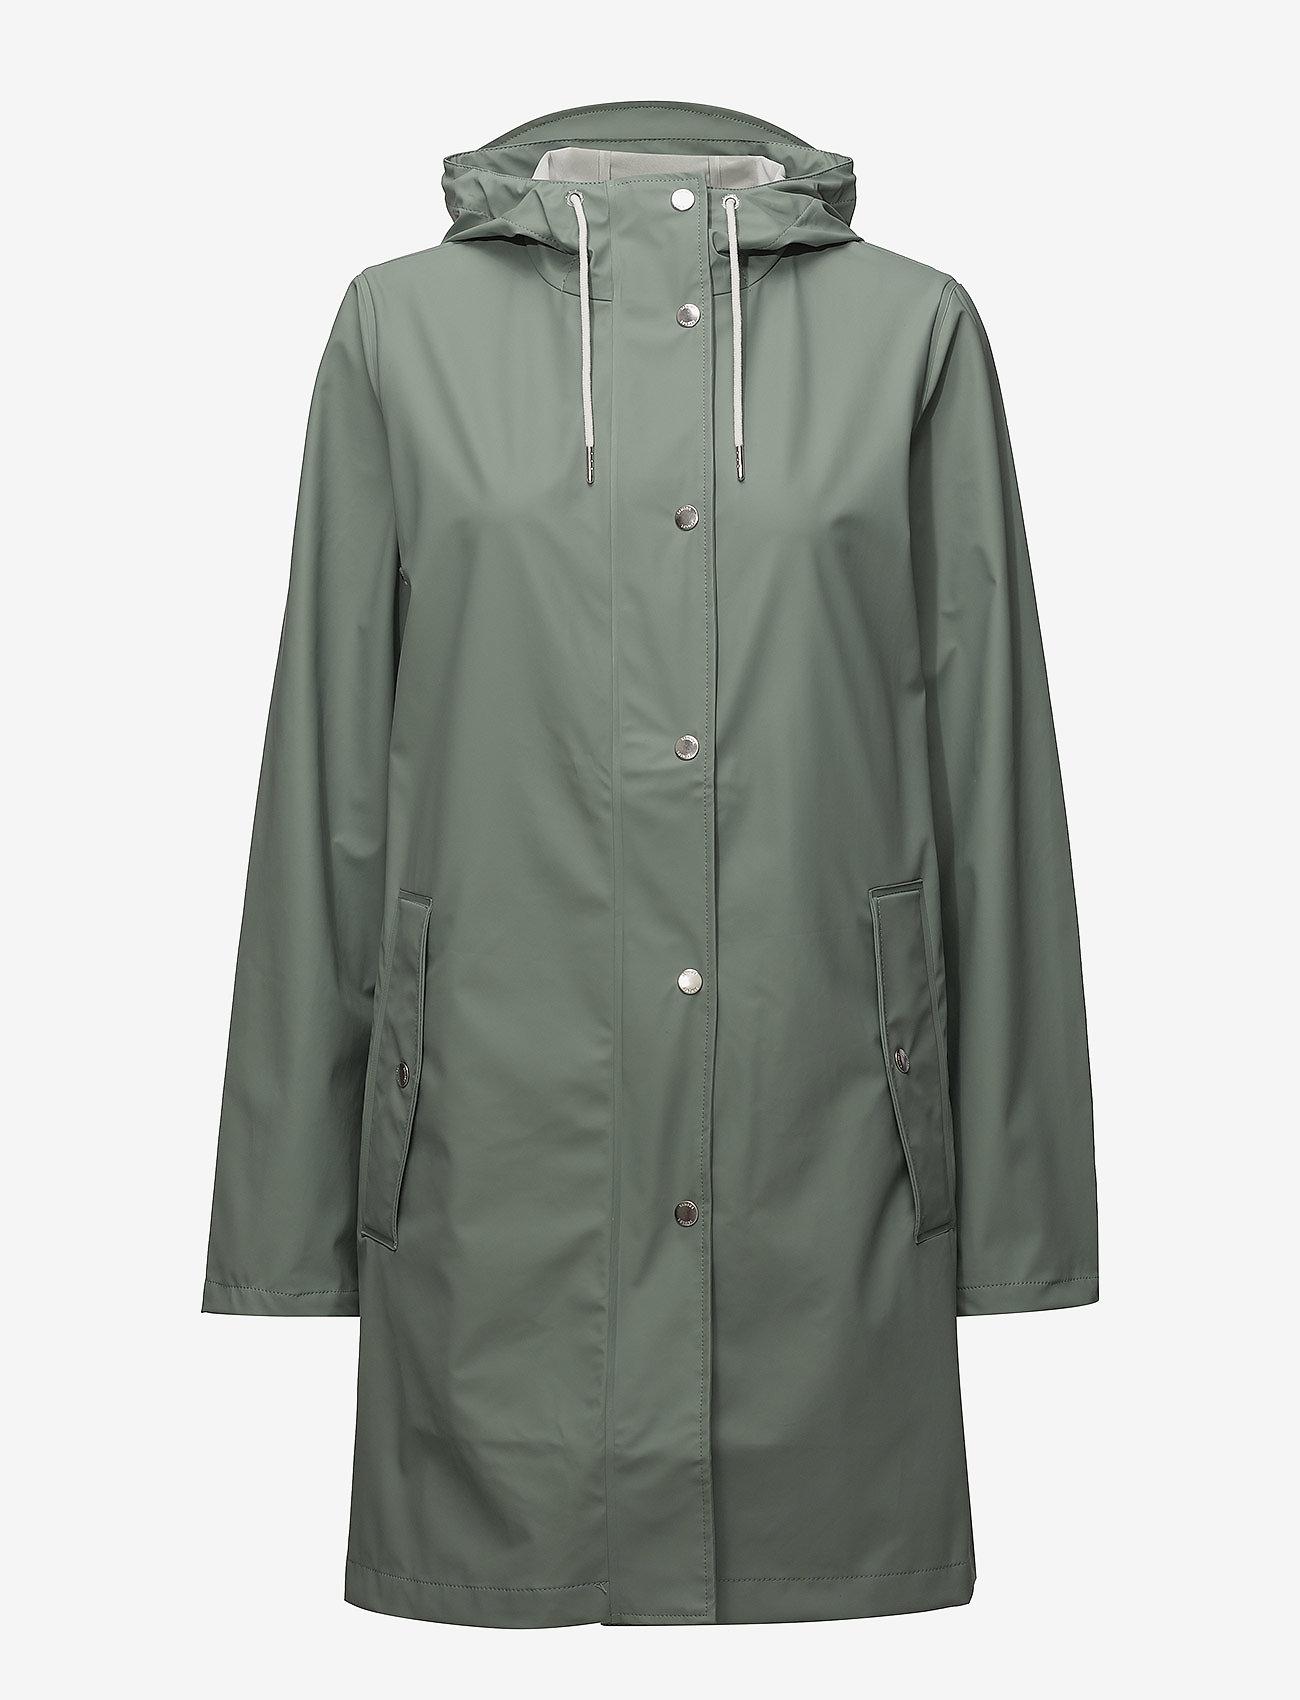 Samsøe Samsøe - Stala jacket 7357 - regnjakker - chinois green - 1